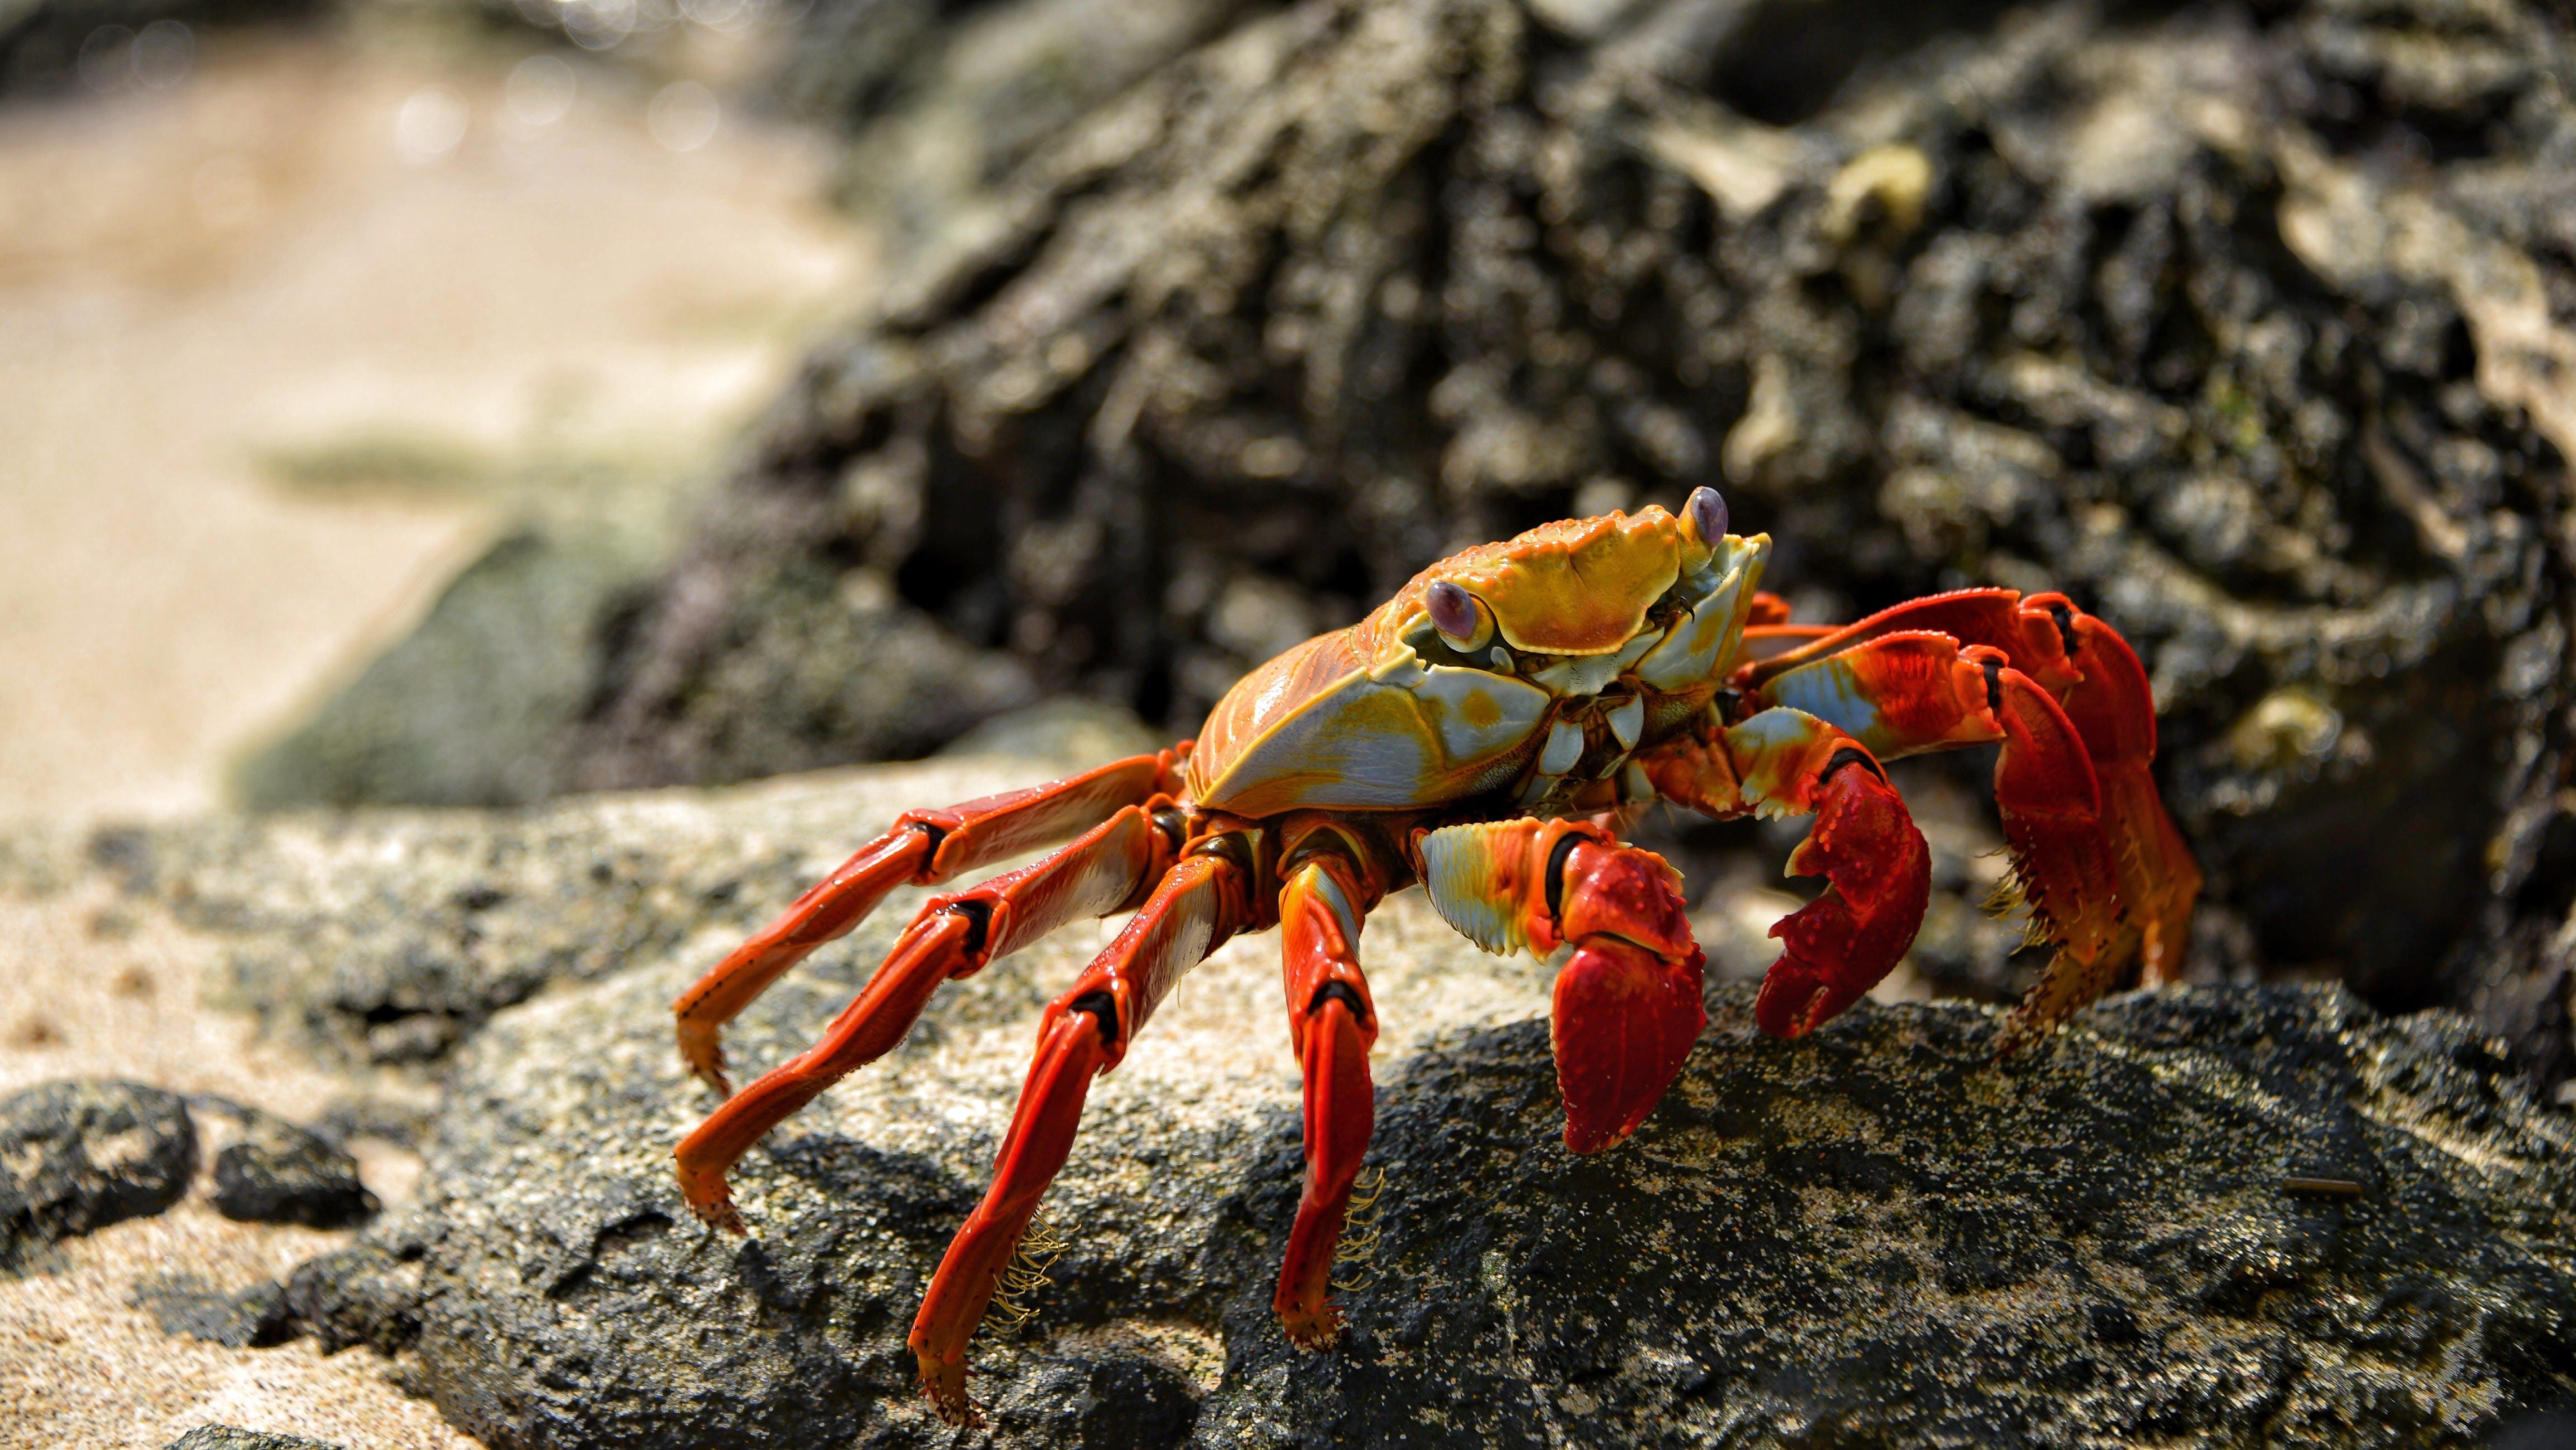 Orange Crab in Shallow Photo